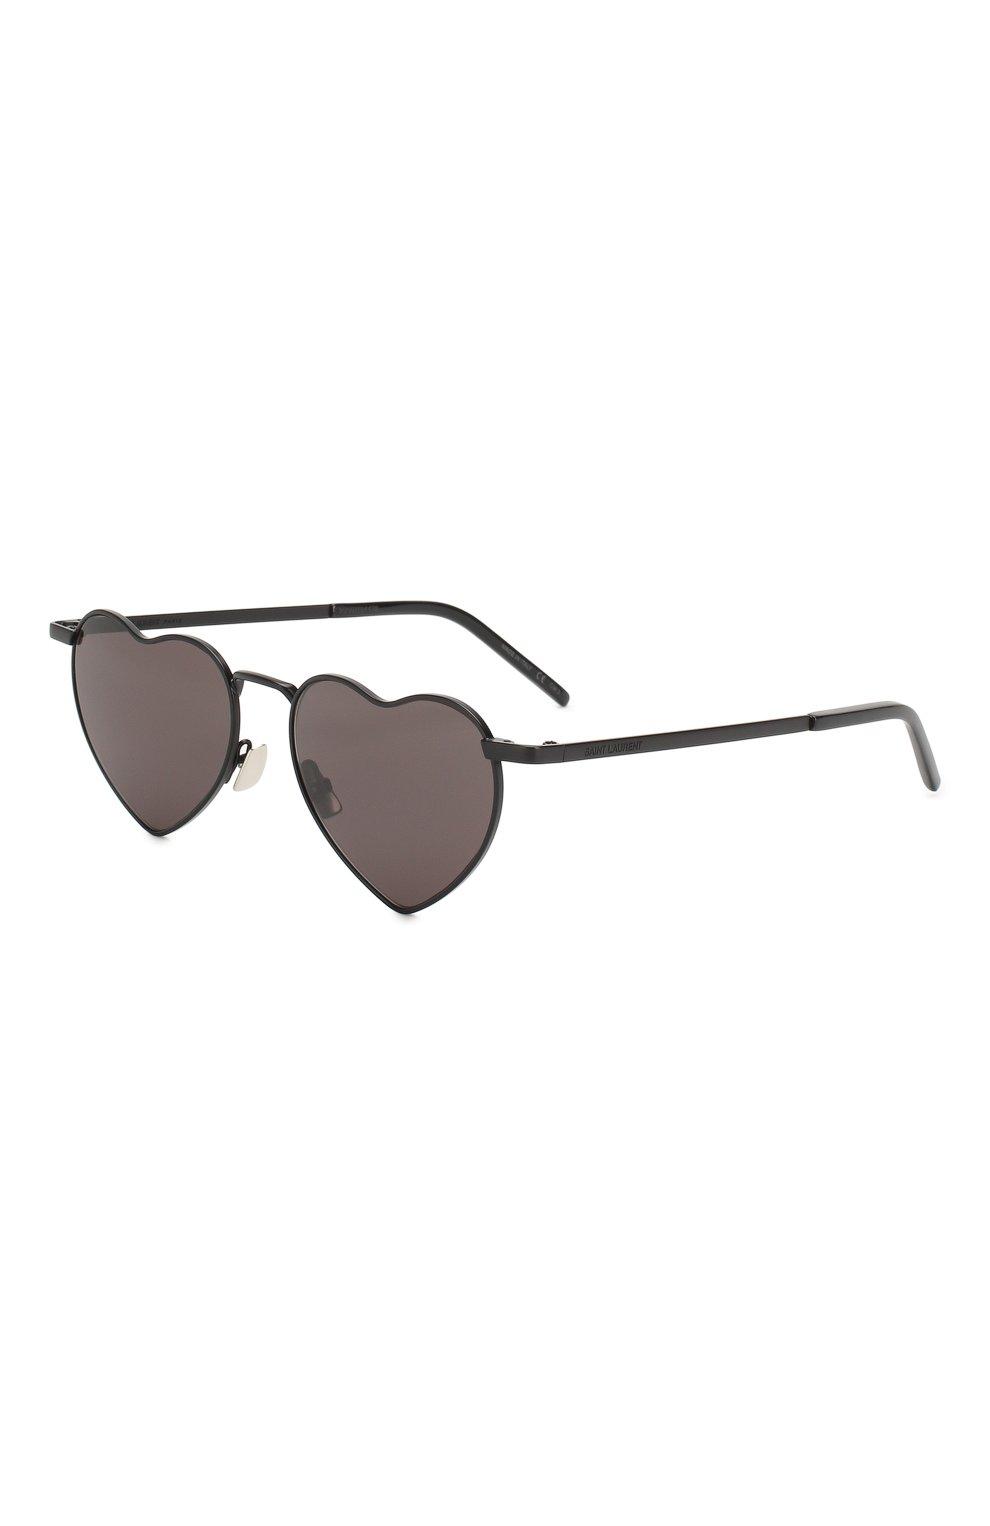 Женские солнцезащитные очки SAINT LAURENT черного цвета, арт. SL 301 L0UL0U 002 | Фото 1